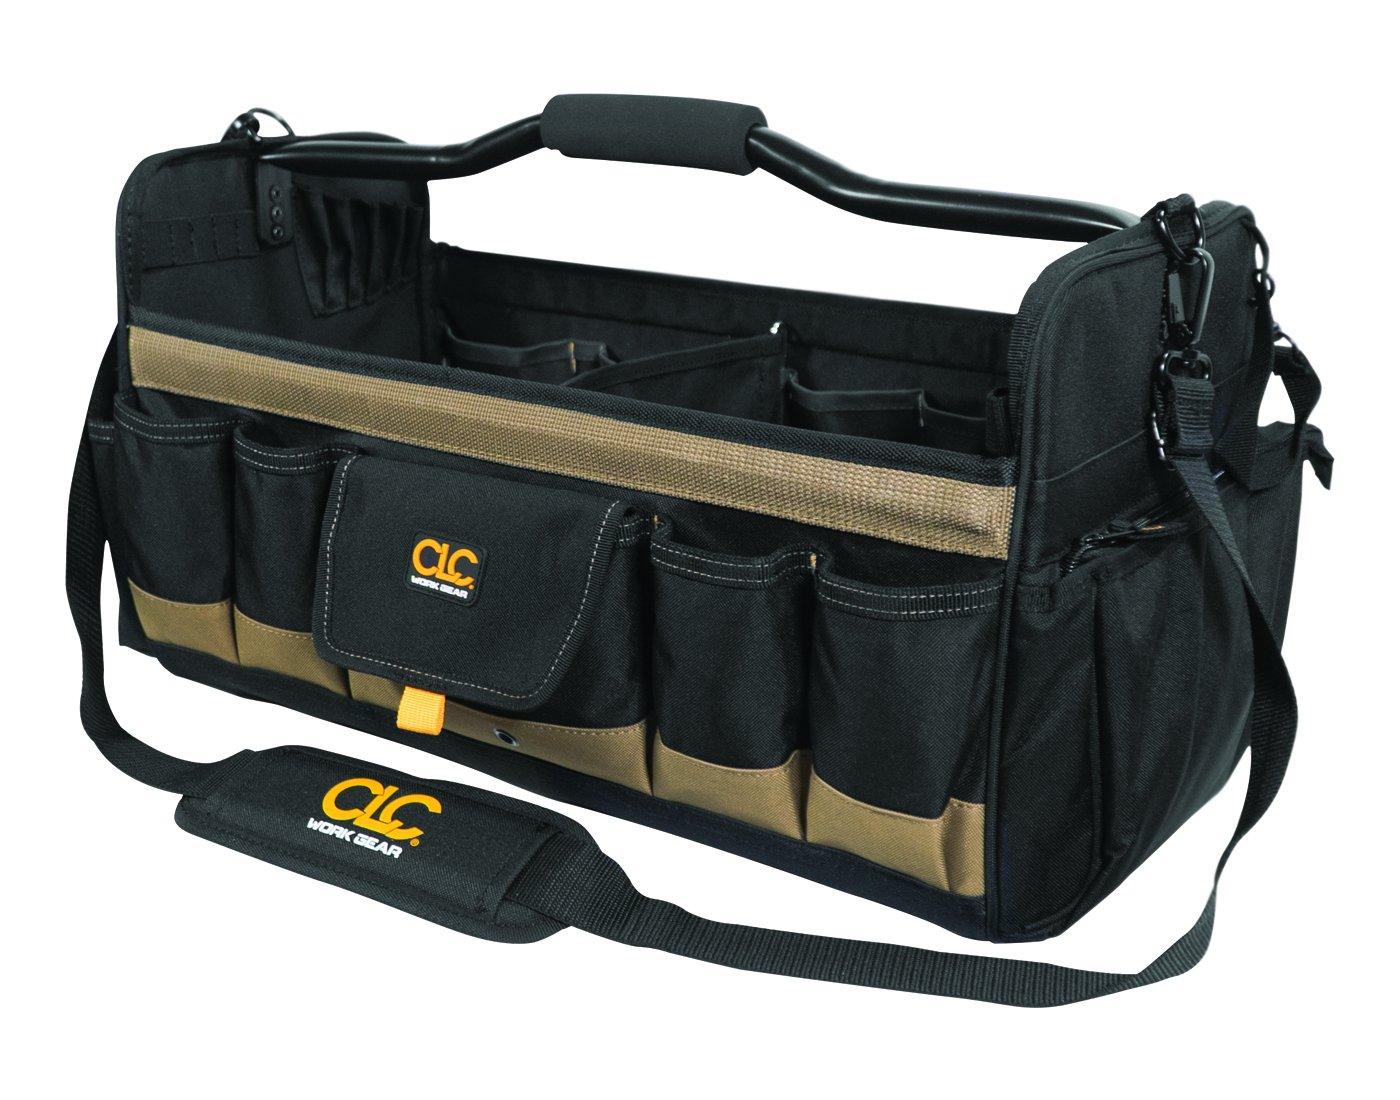 CLC Custom Leathercraft 1579 20 Inch, Open Top, Soft Sided Tool Box, 27 Pockets by Custom Leathercraft